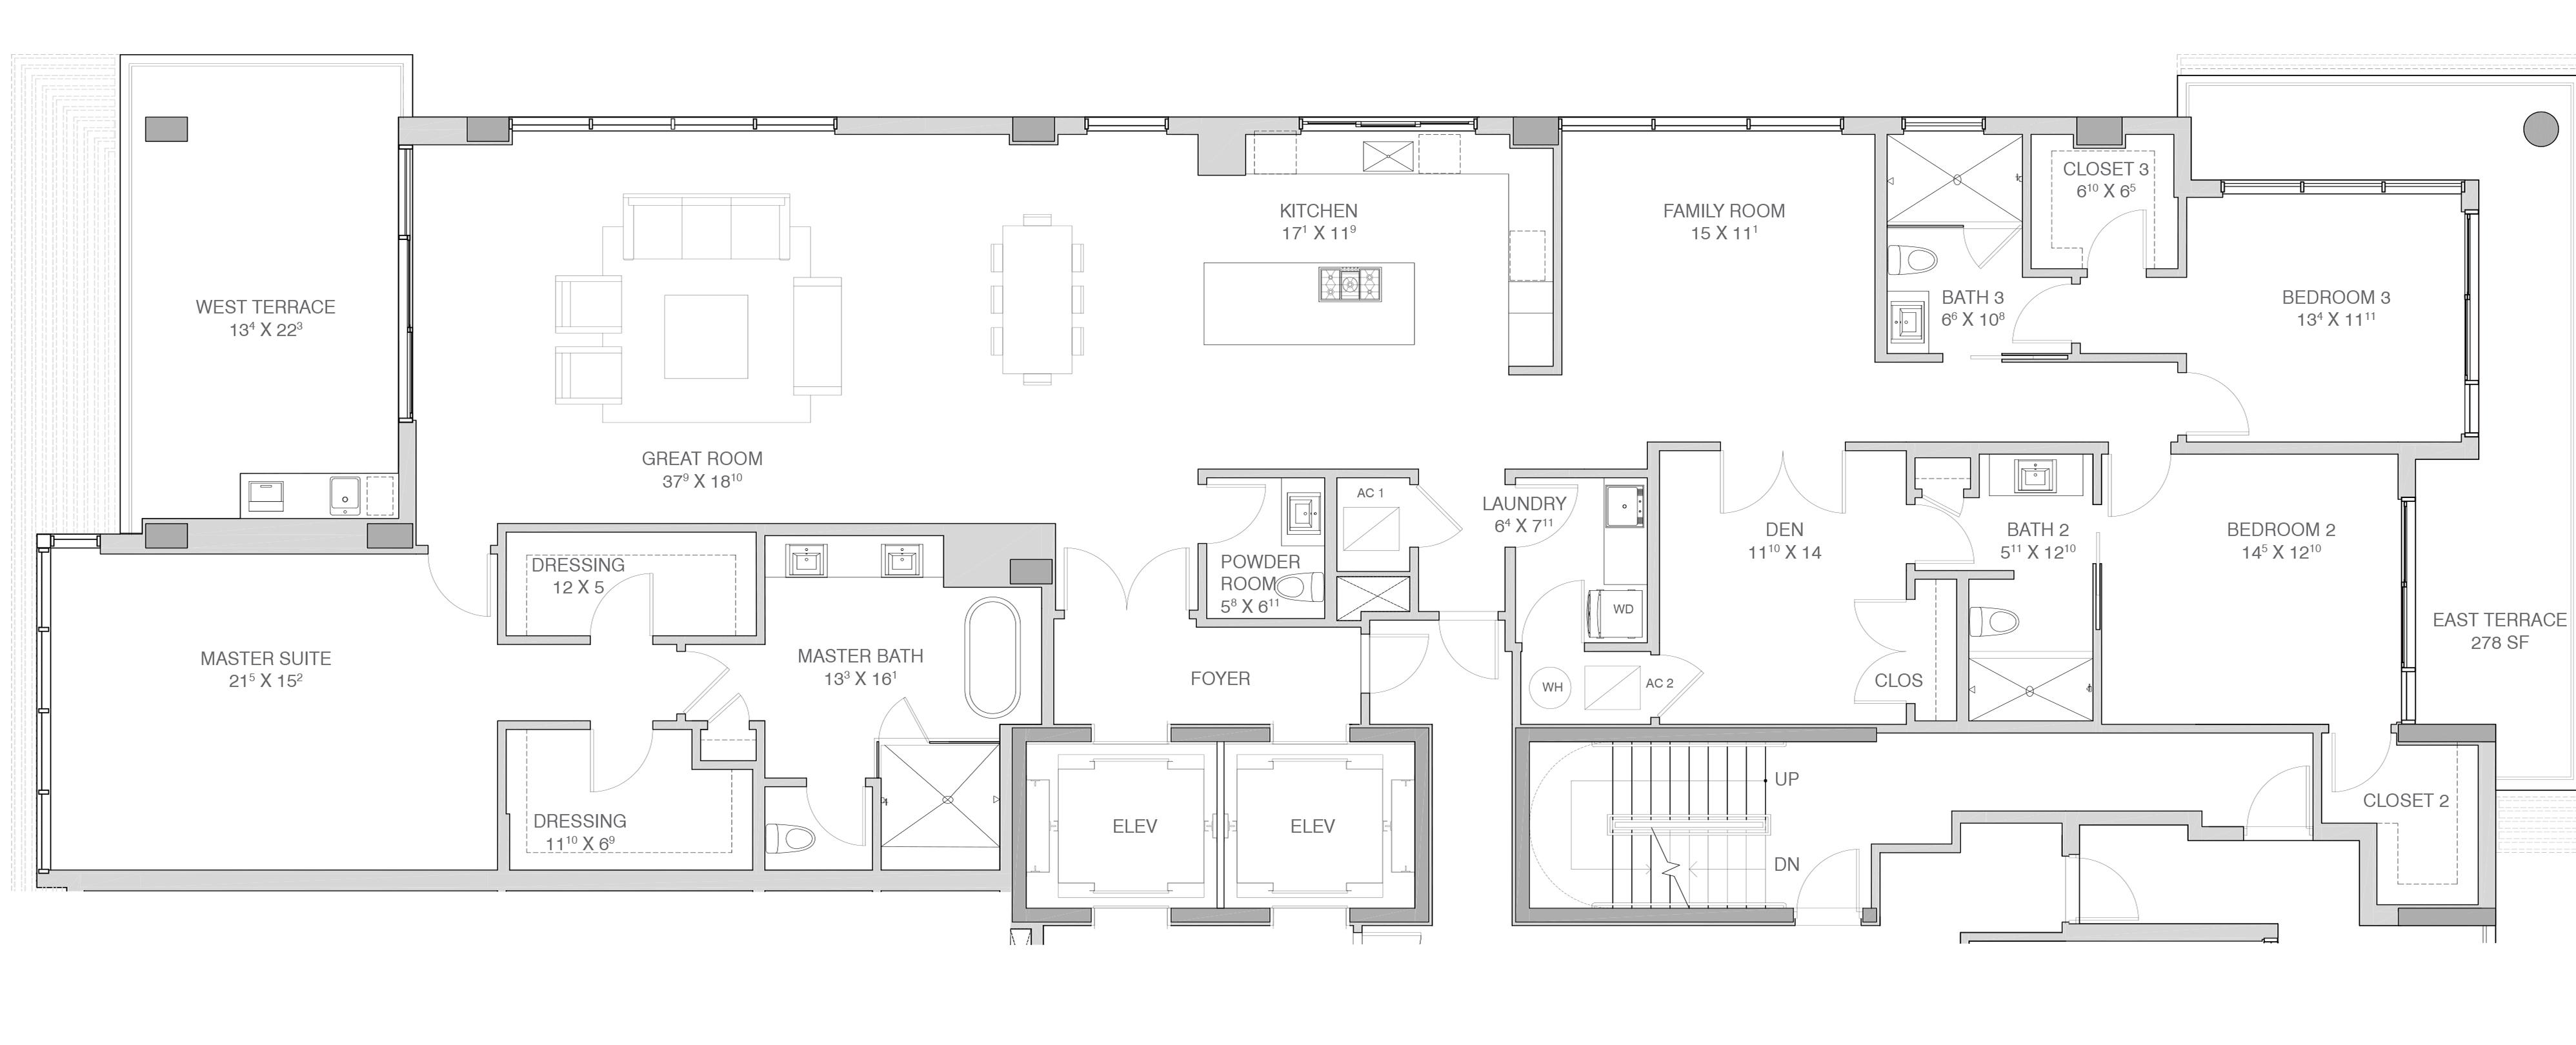 Adagio Fort Lauderdale Beach - Floorplan 4